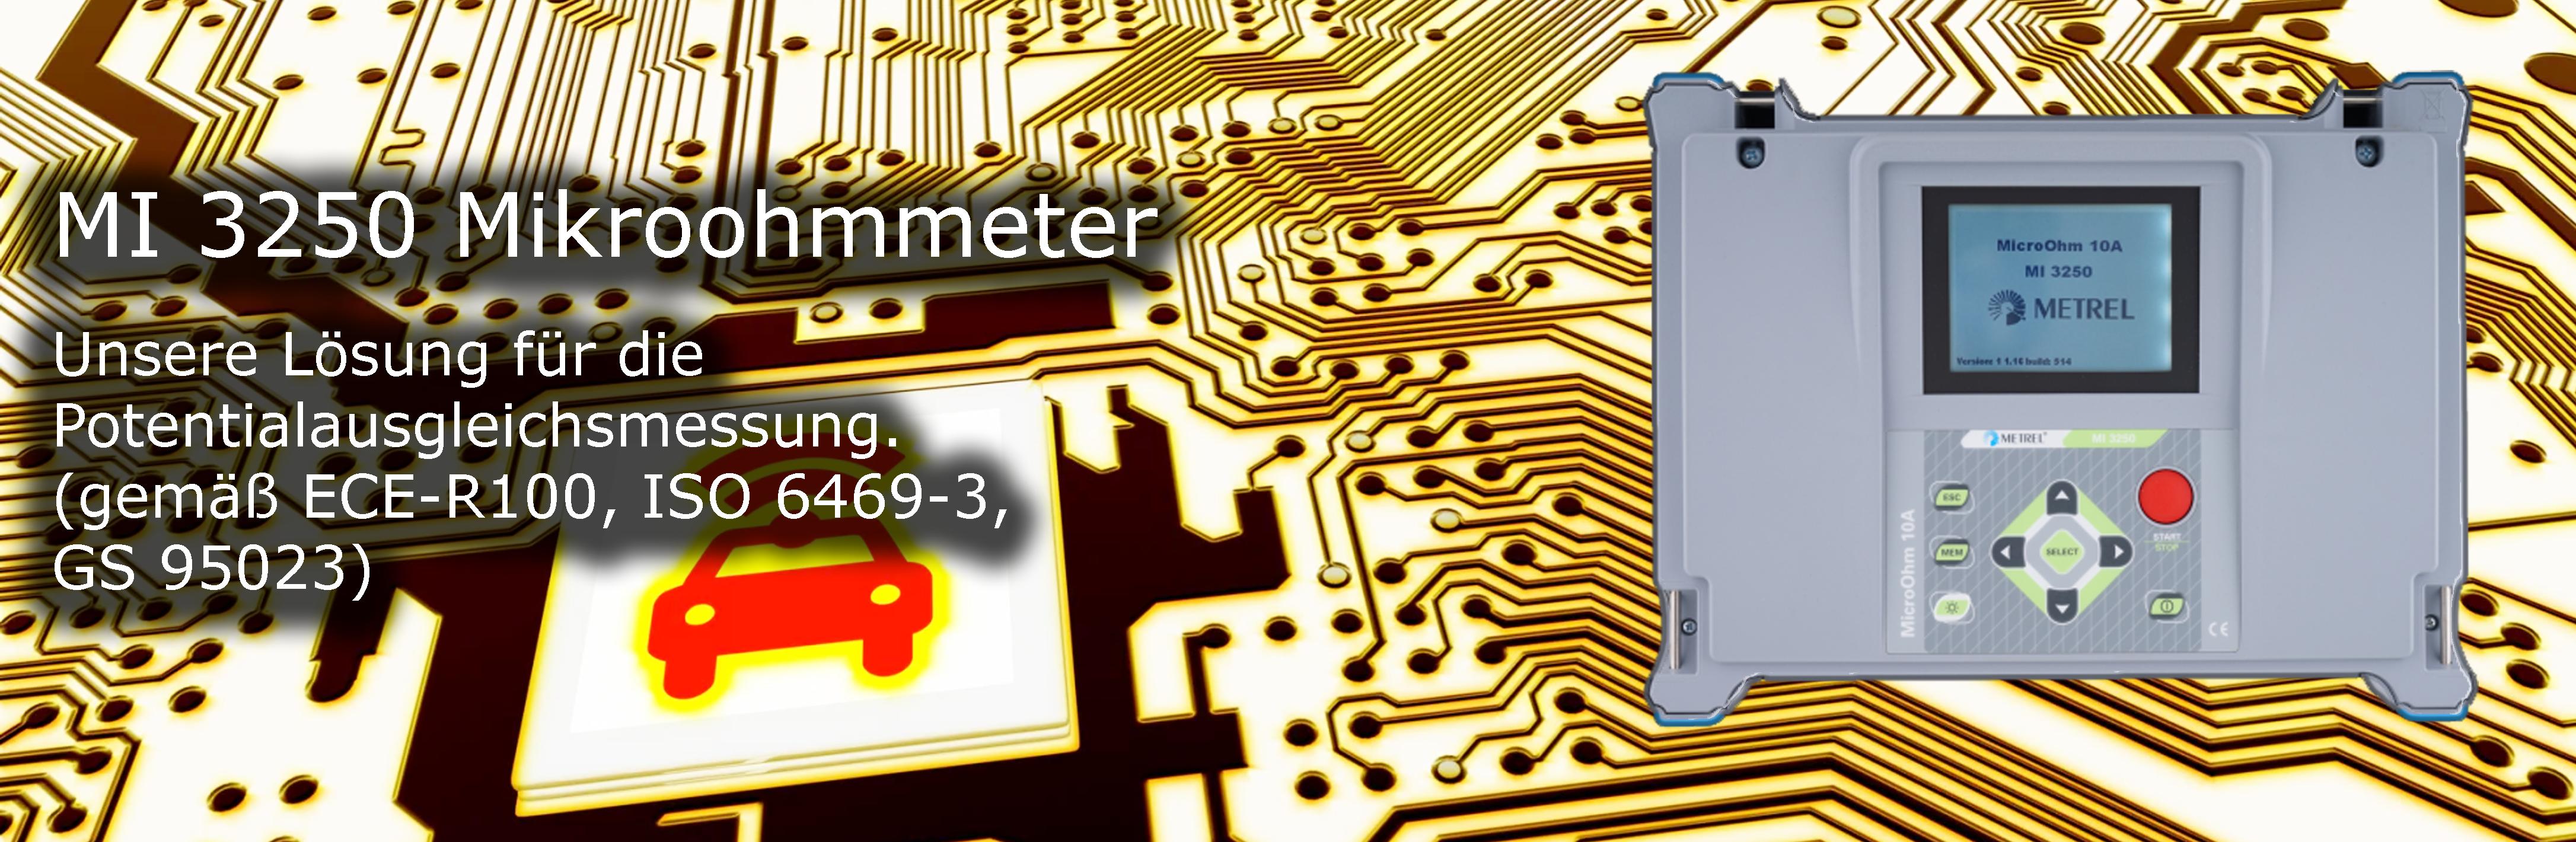 MI 3250 Microohmmeter